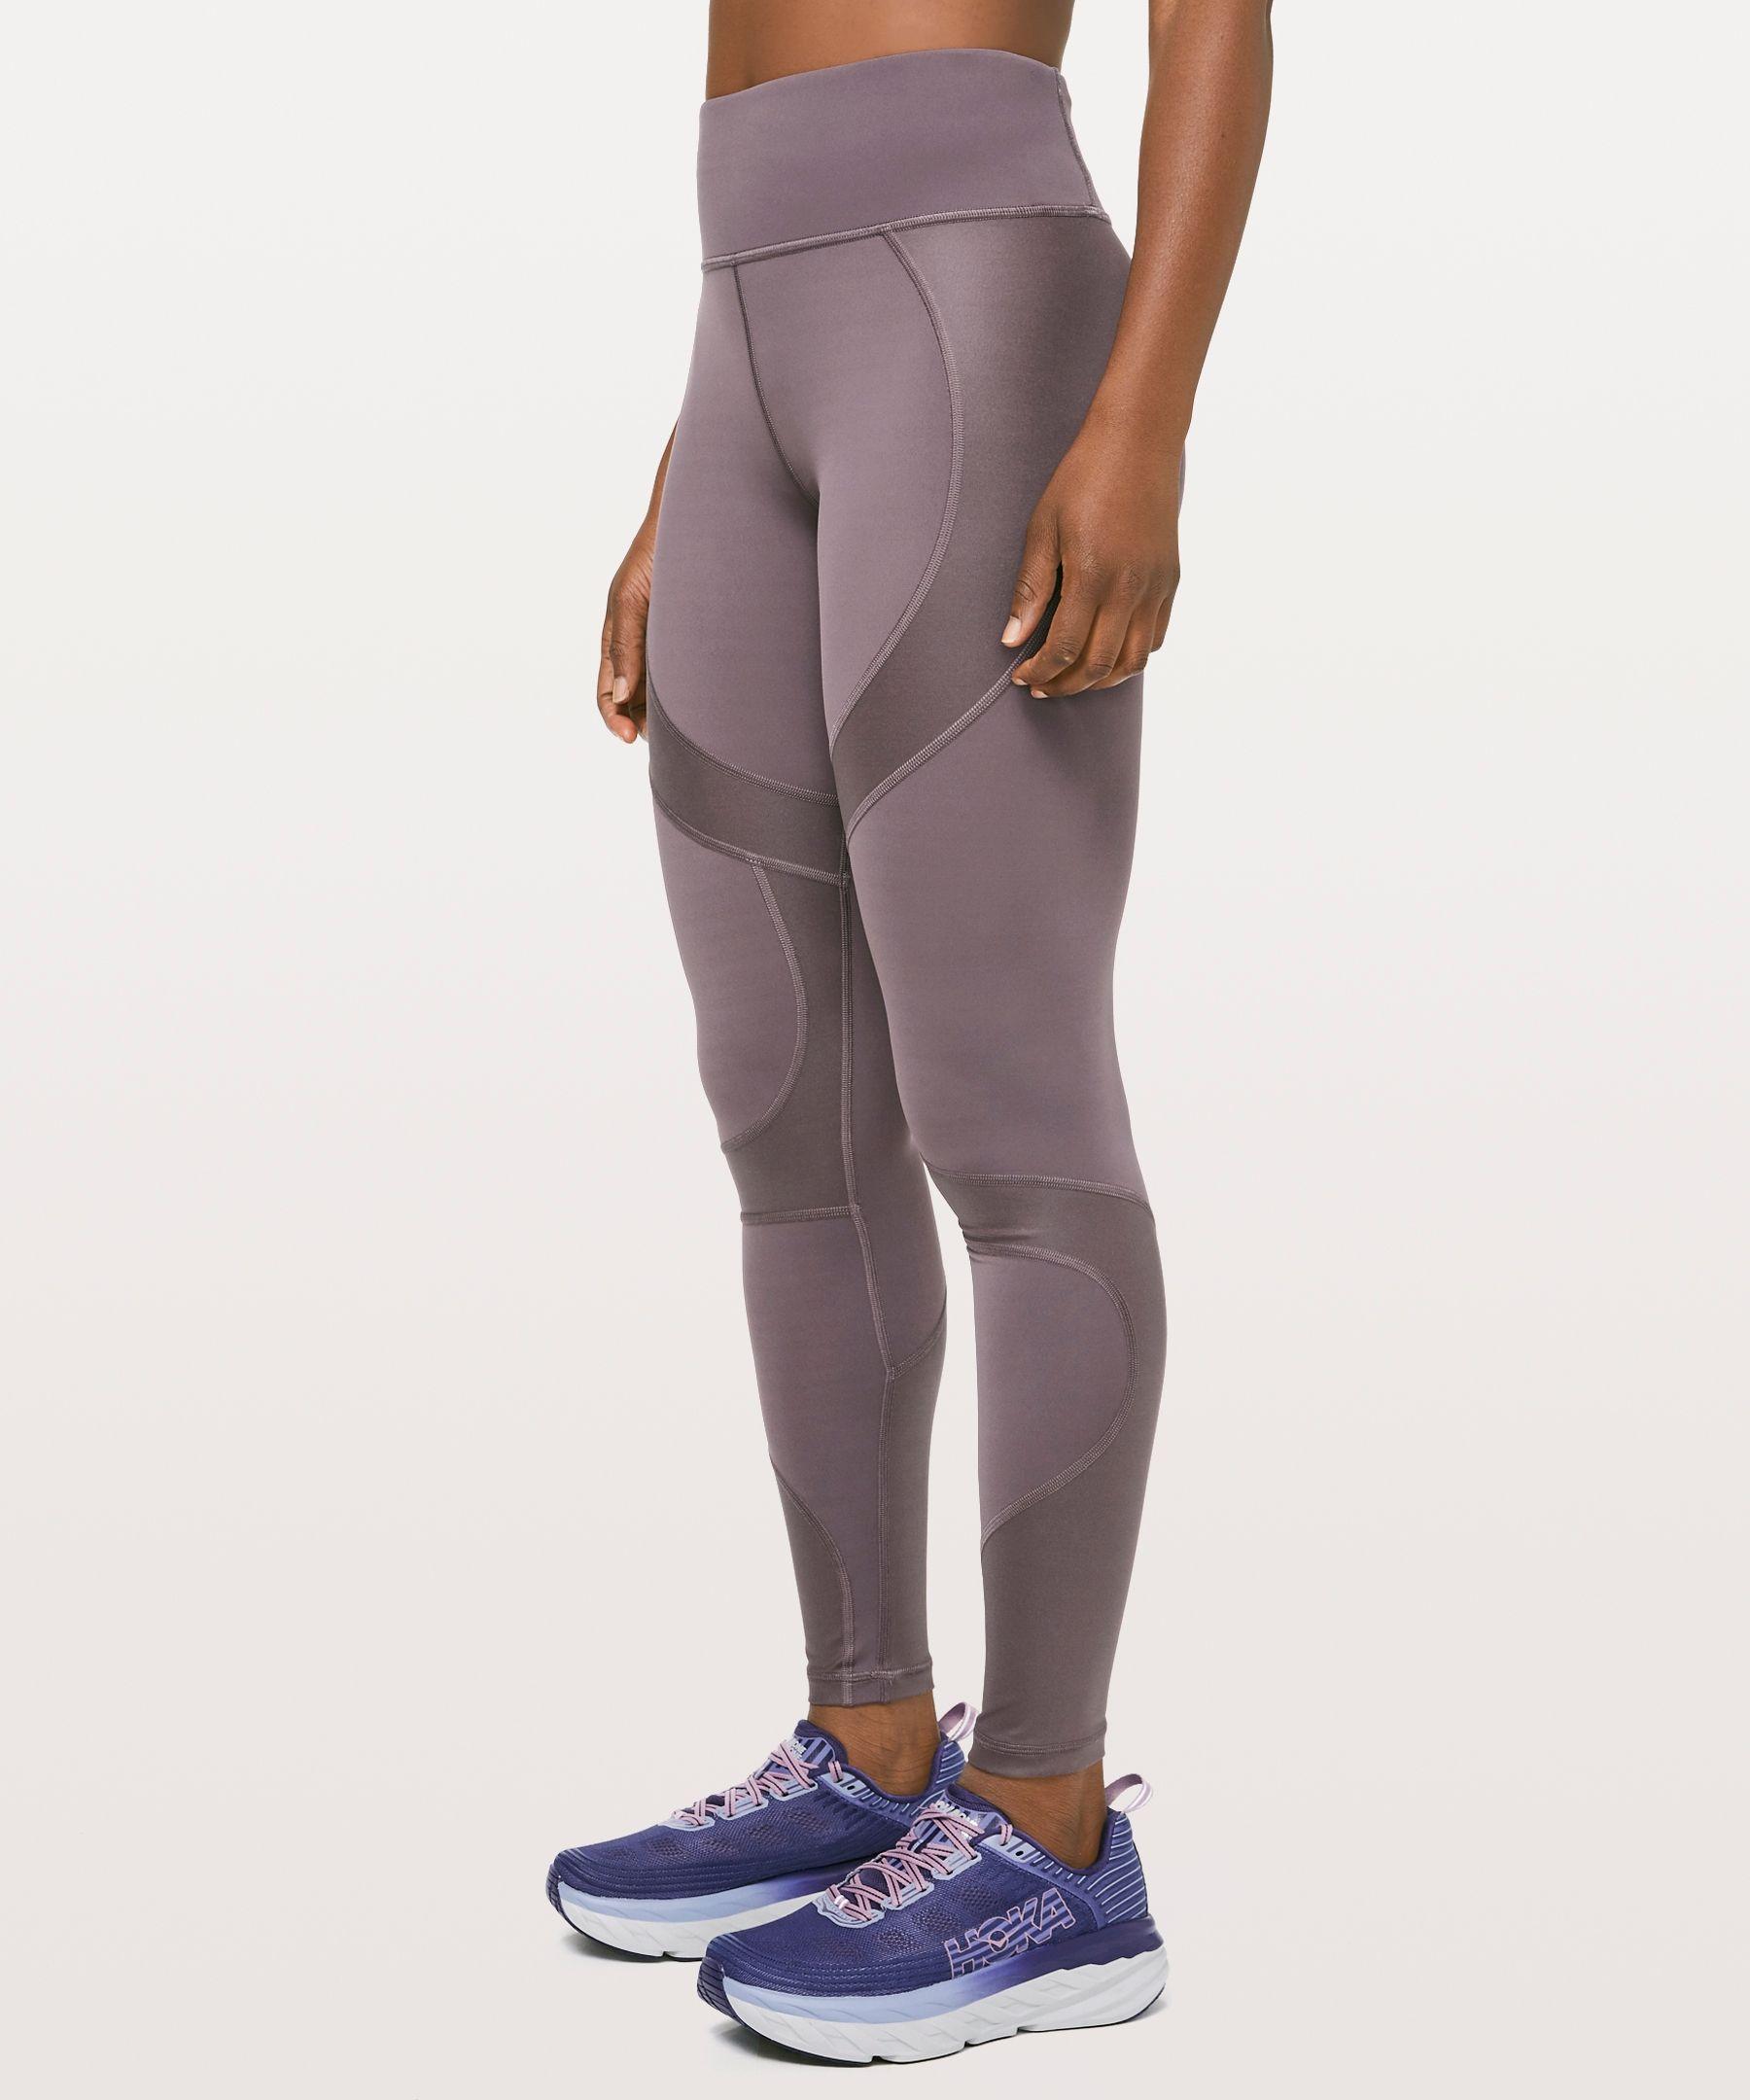 ae08c46c lululemon Women's City Core Legging 28